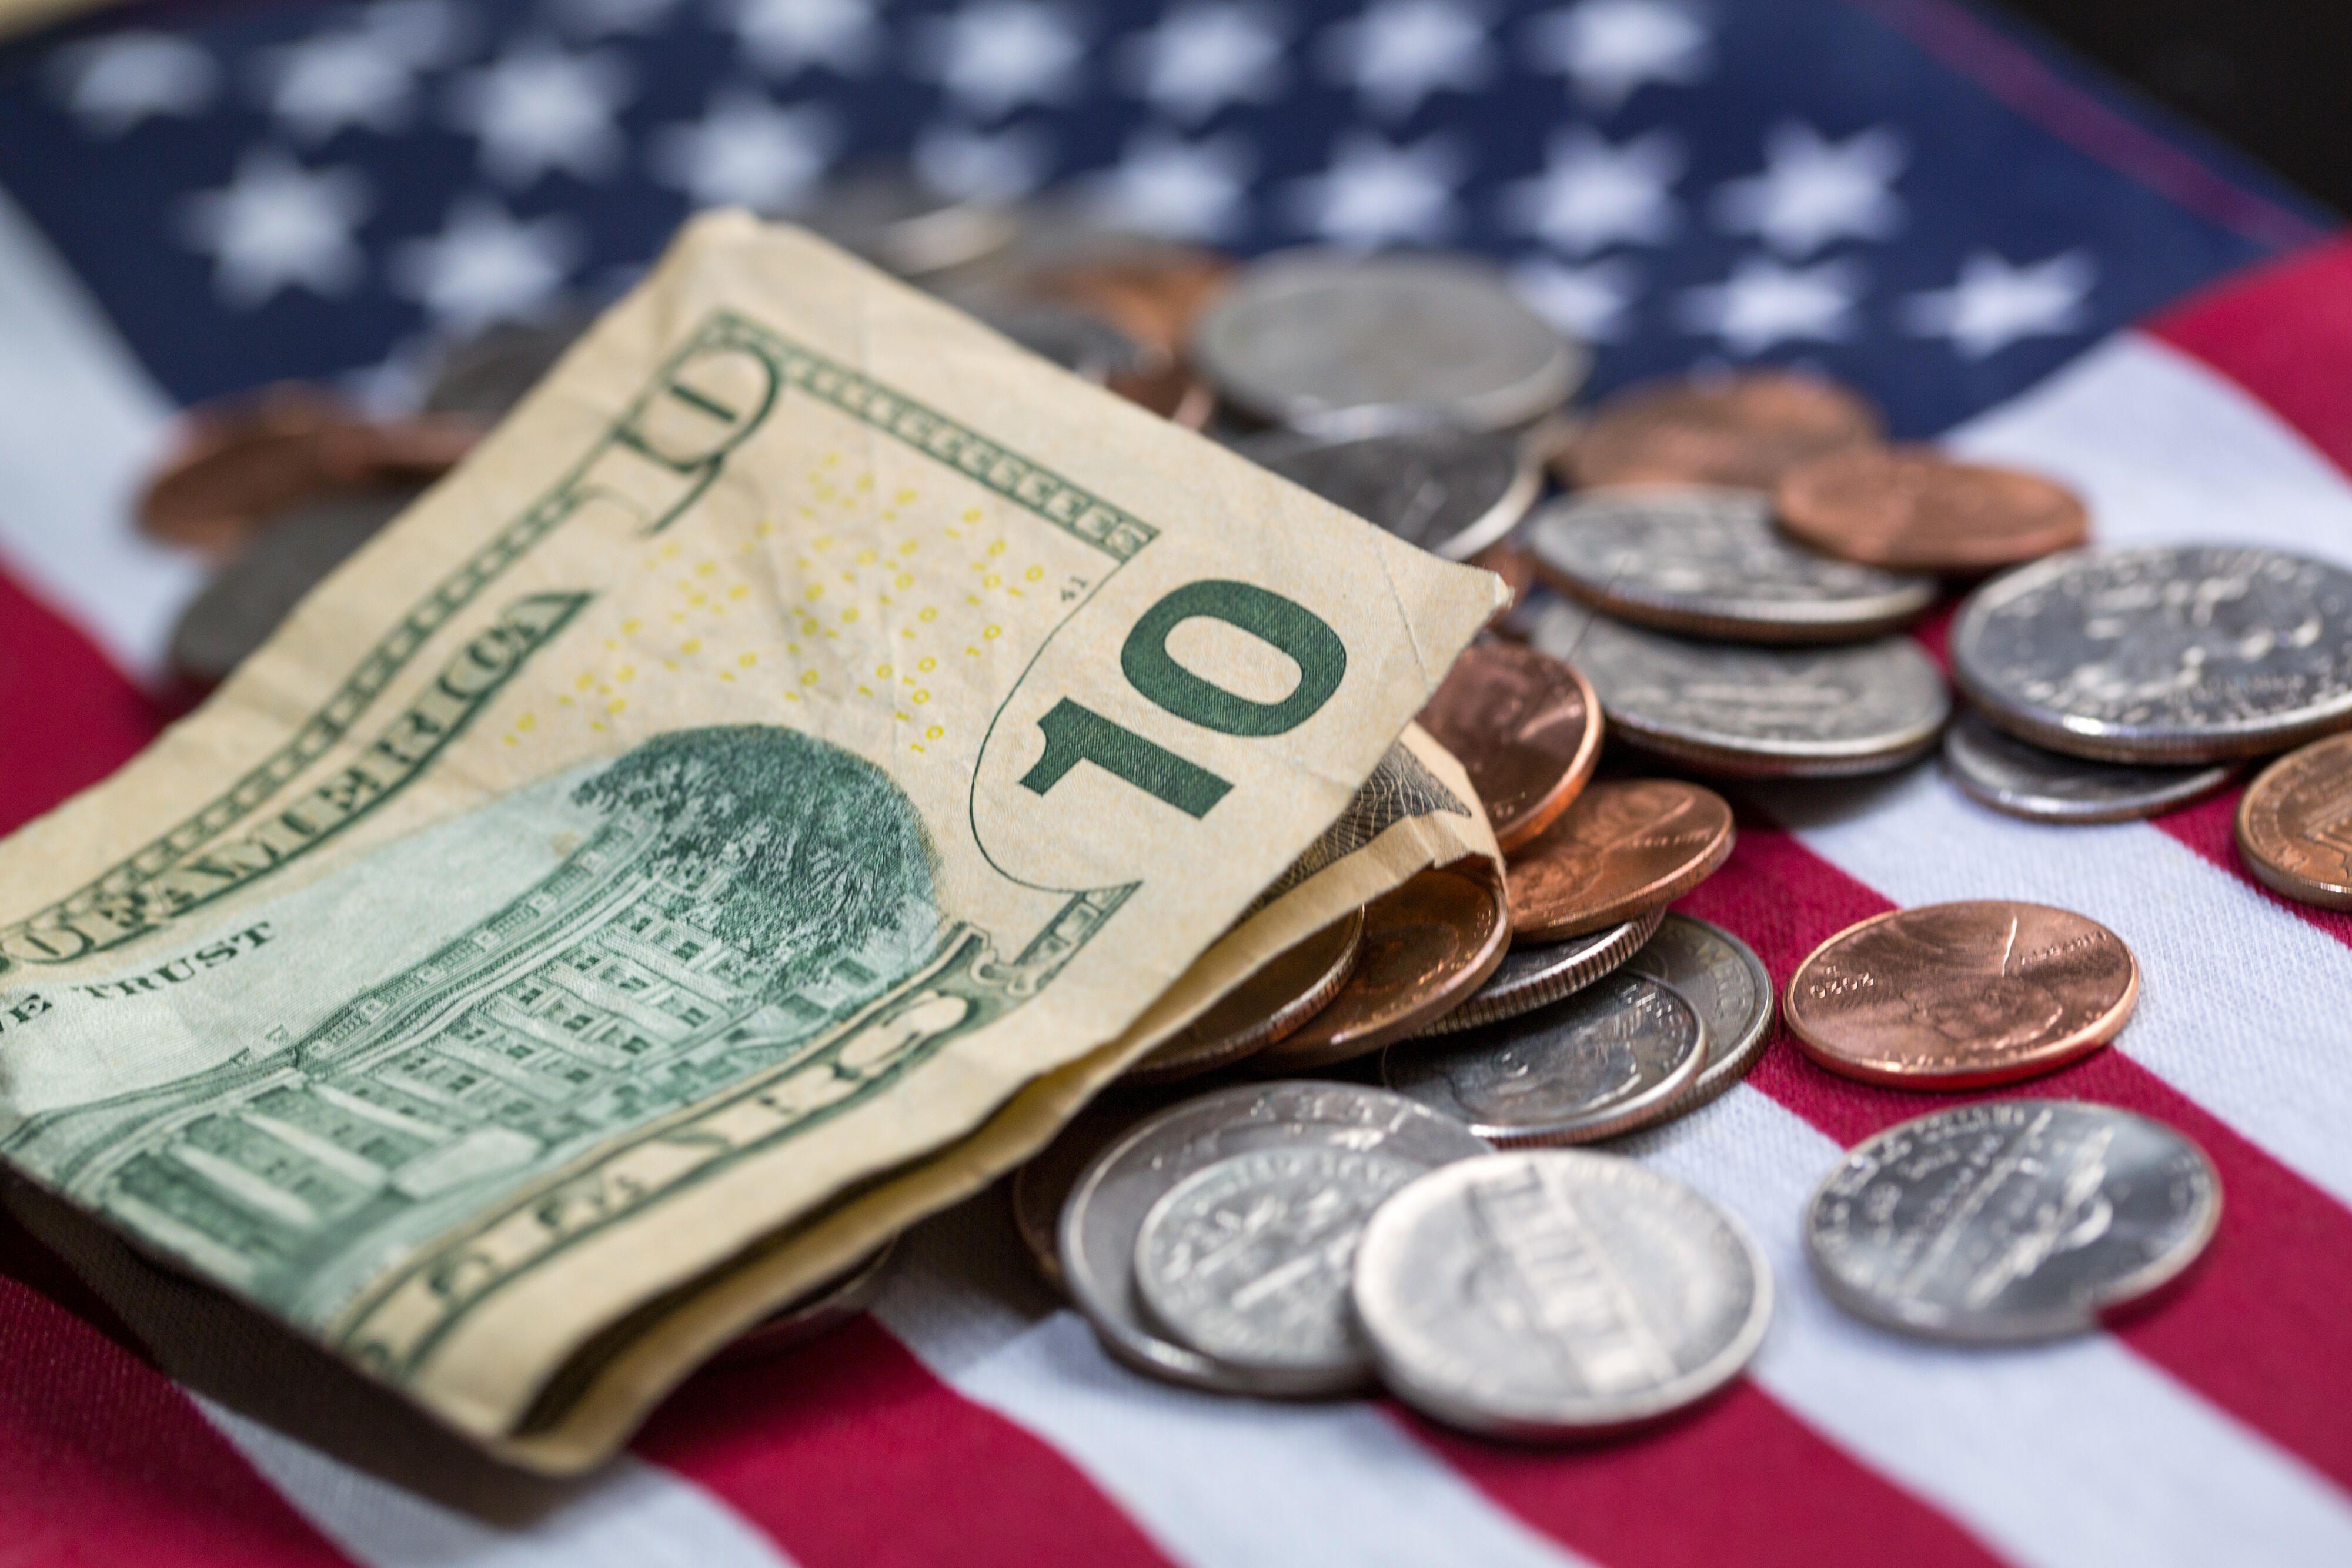 money-cash-dollars-bills-bank-stimulus-covid-finance-7182